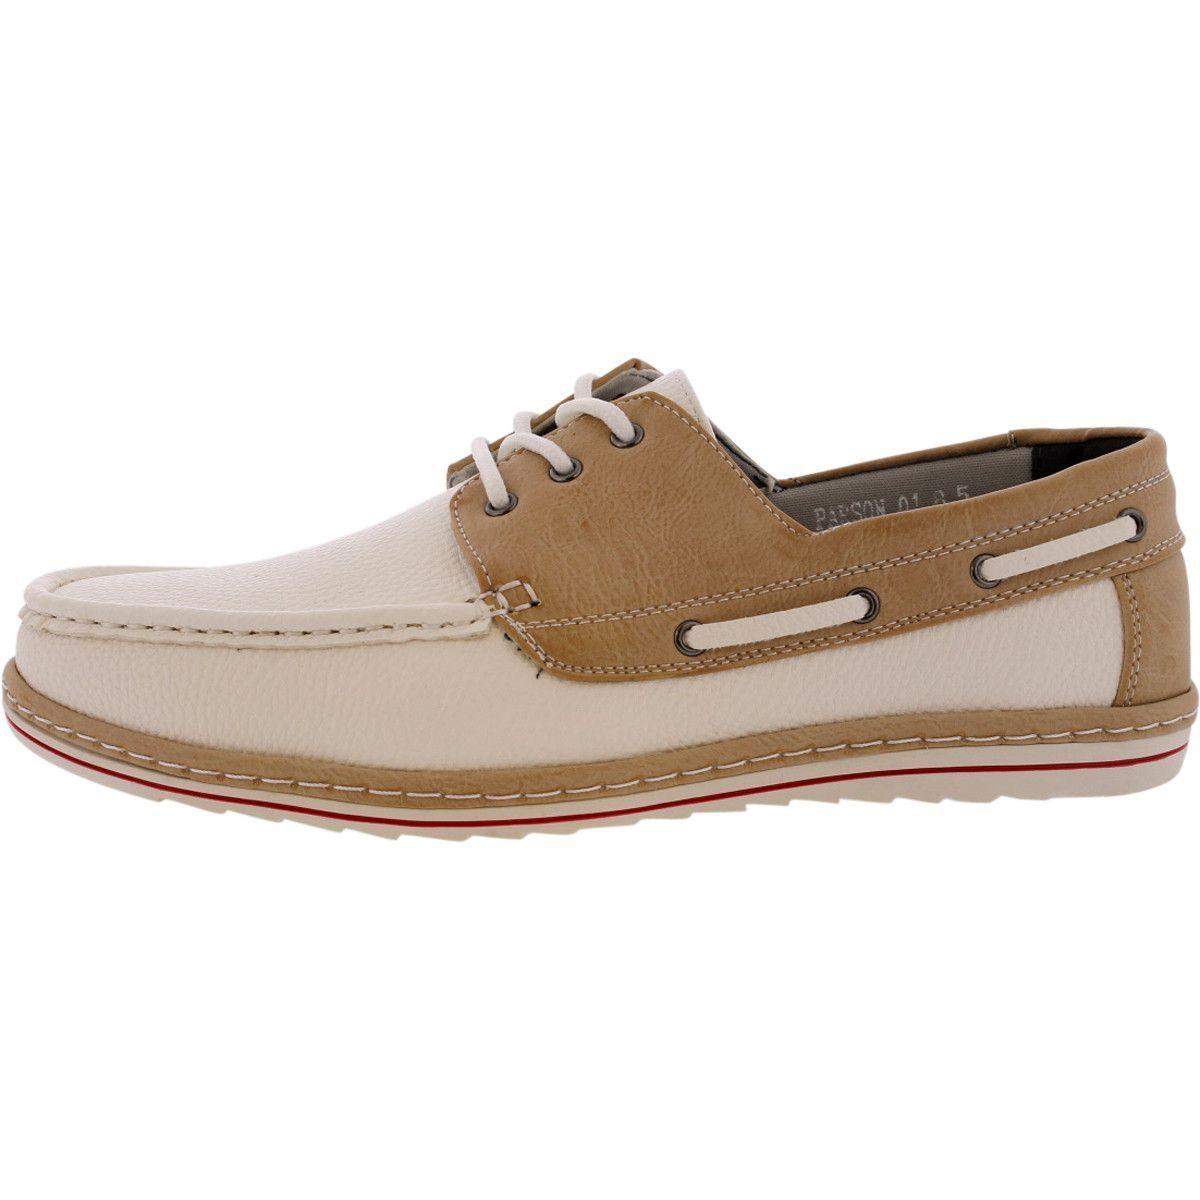 Brixton mens boat shoes beige boat shoes mens boat